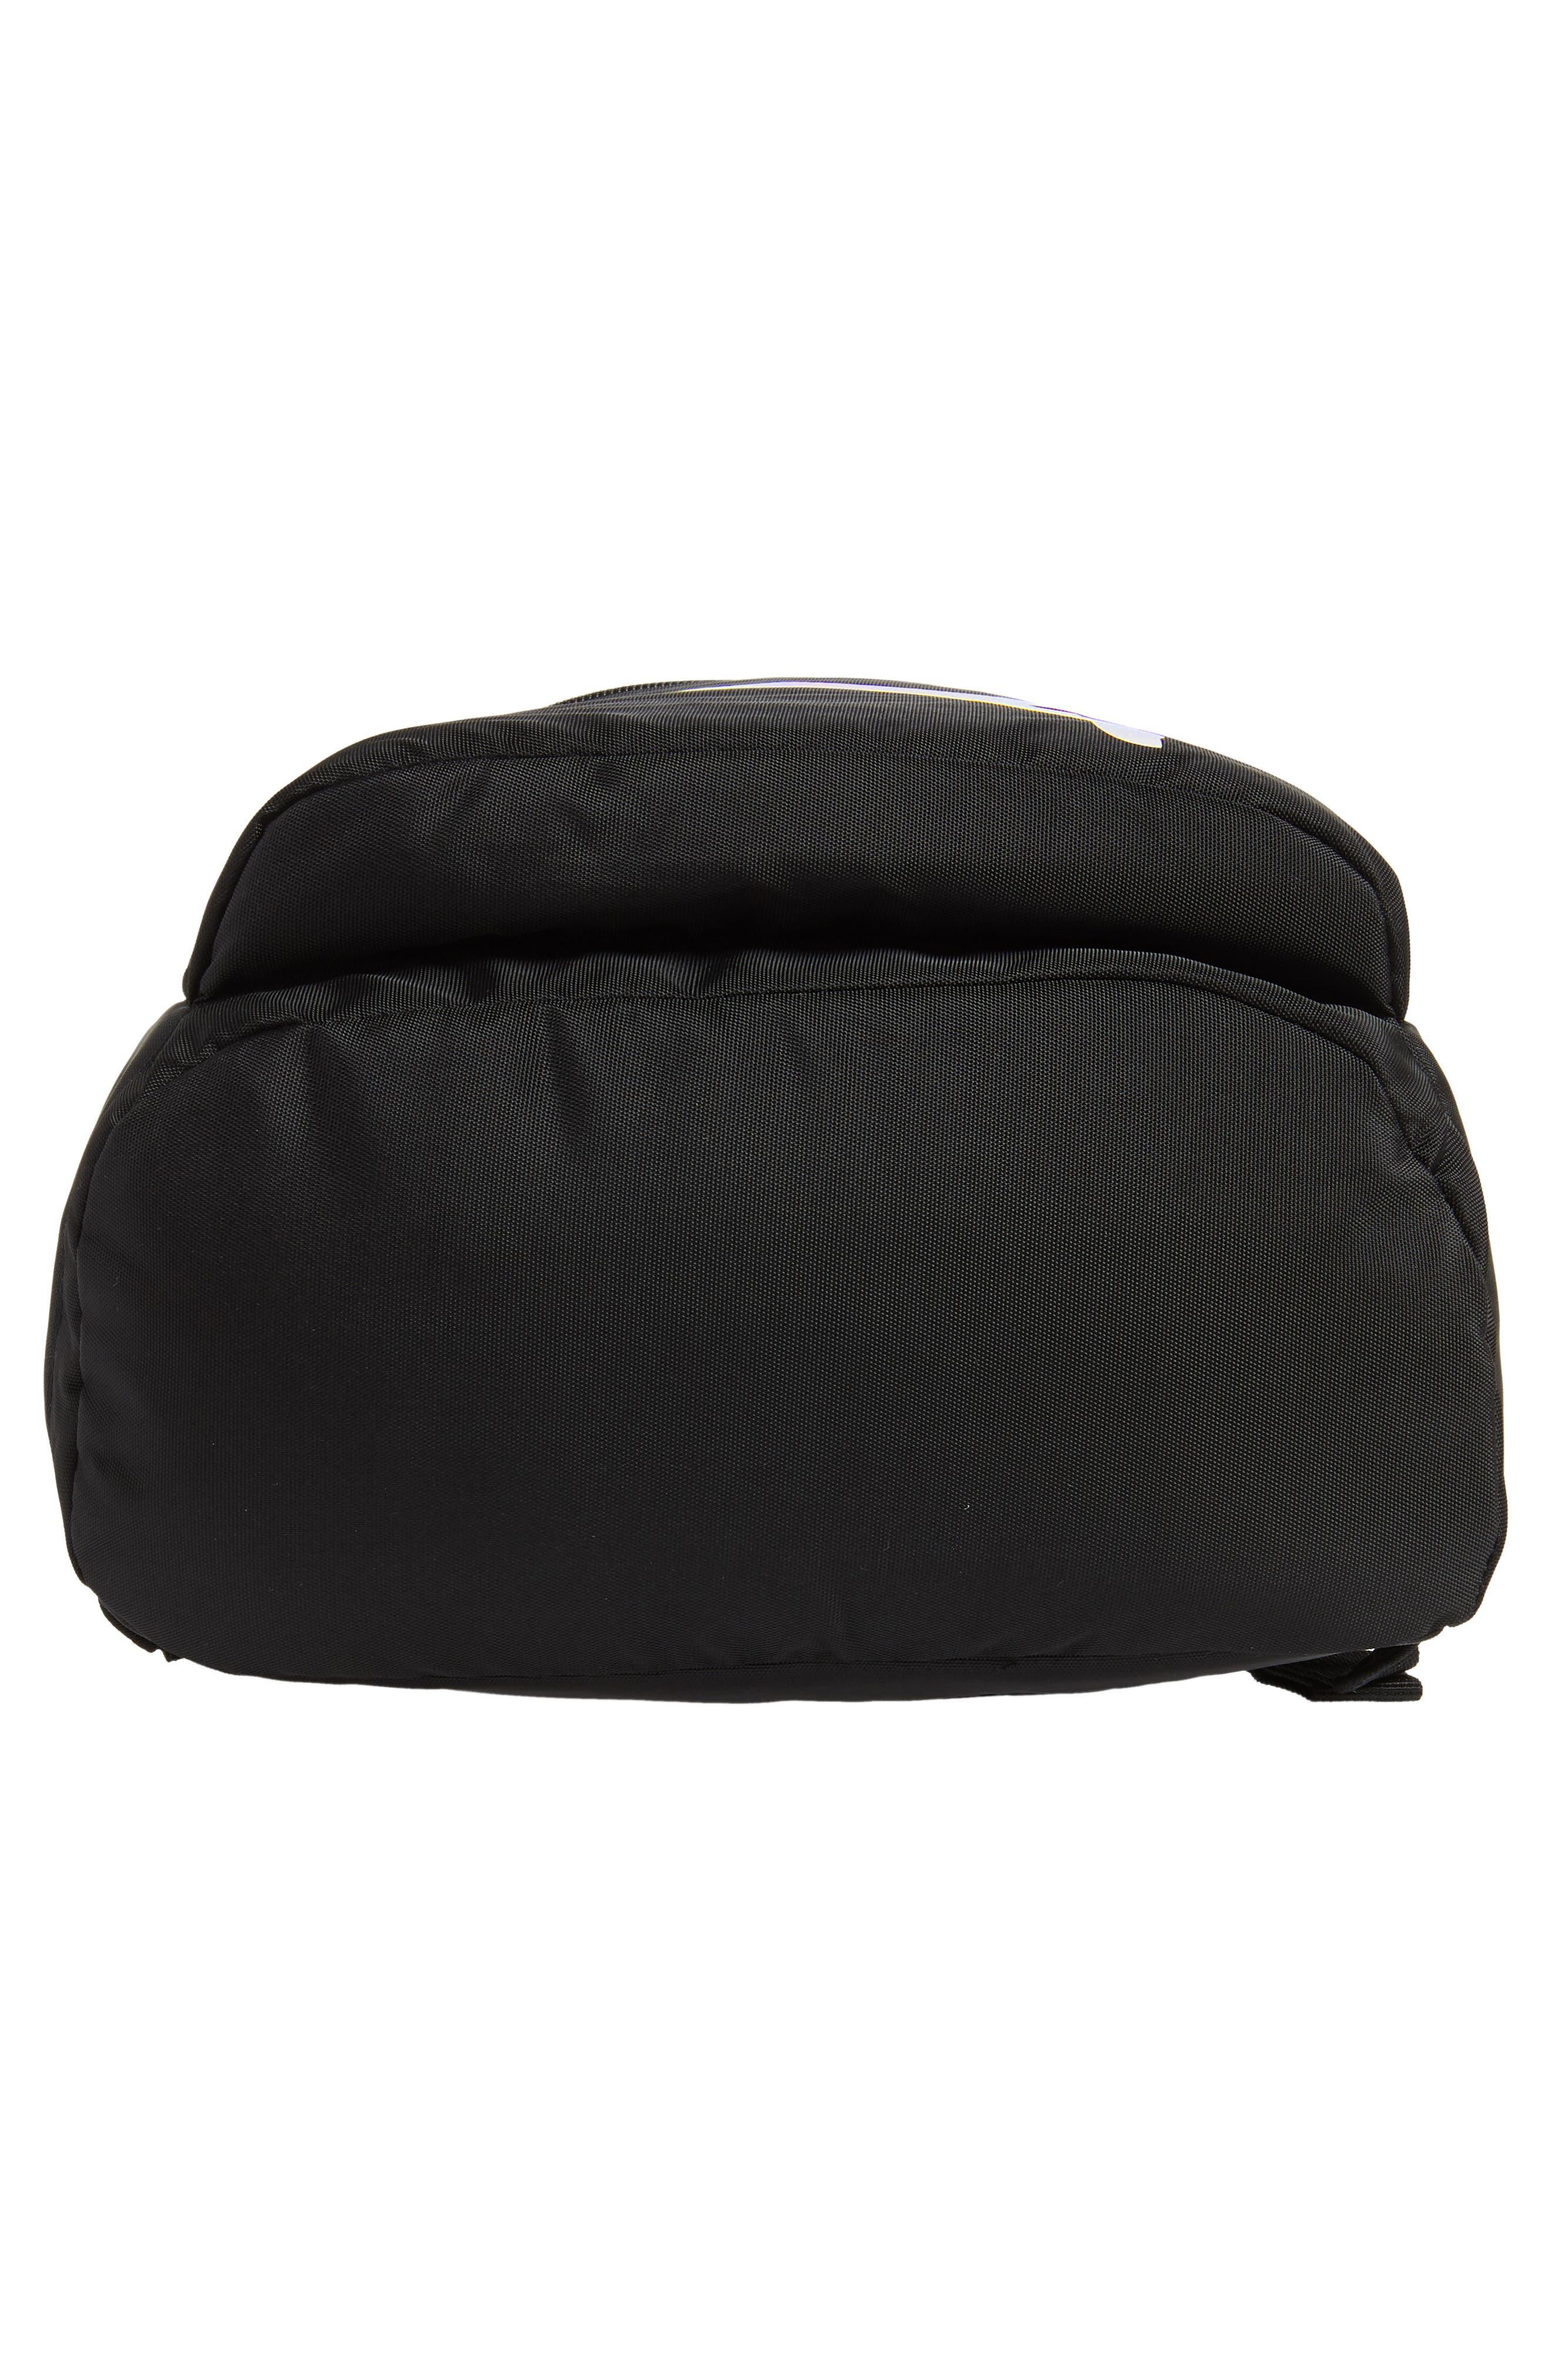 Essential Backpack,                             Alternate thumbnail 6, color,                             BLACK